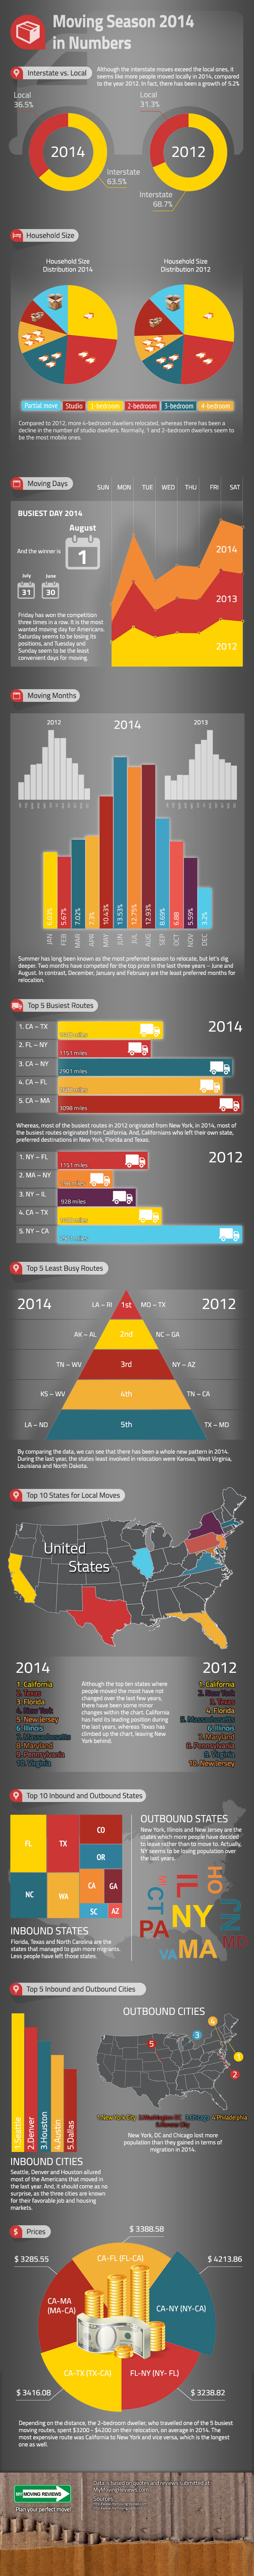 2014 Moving Season In Numbers